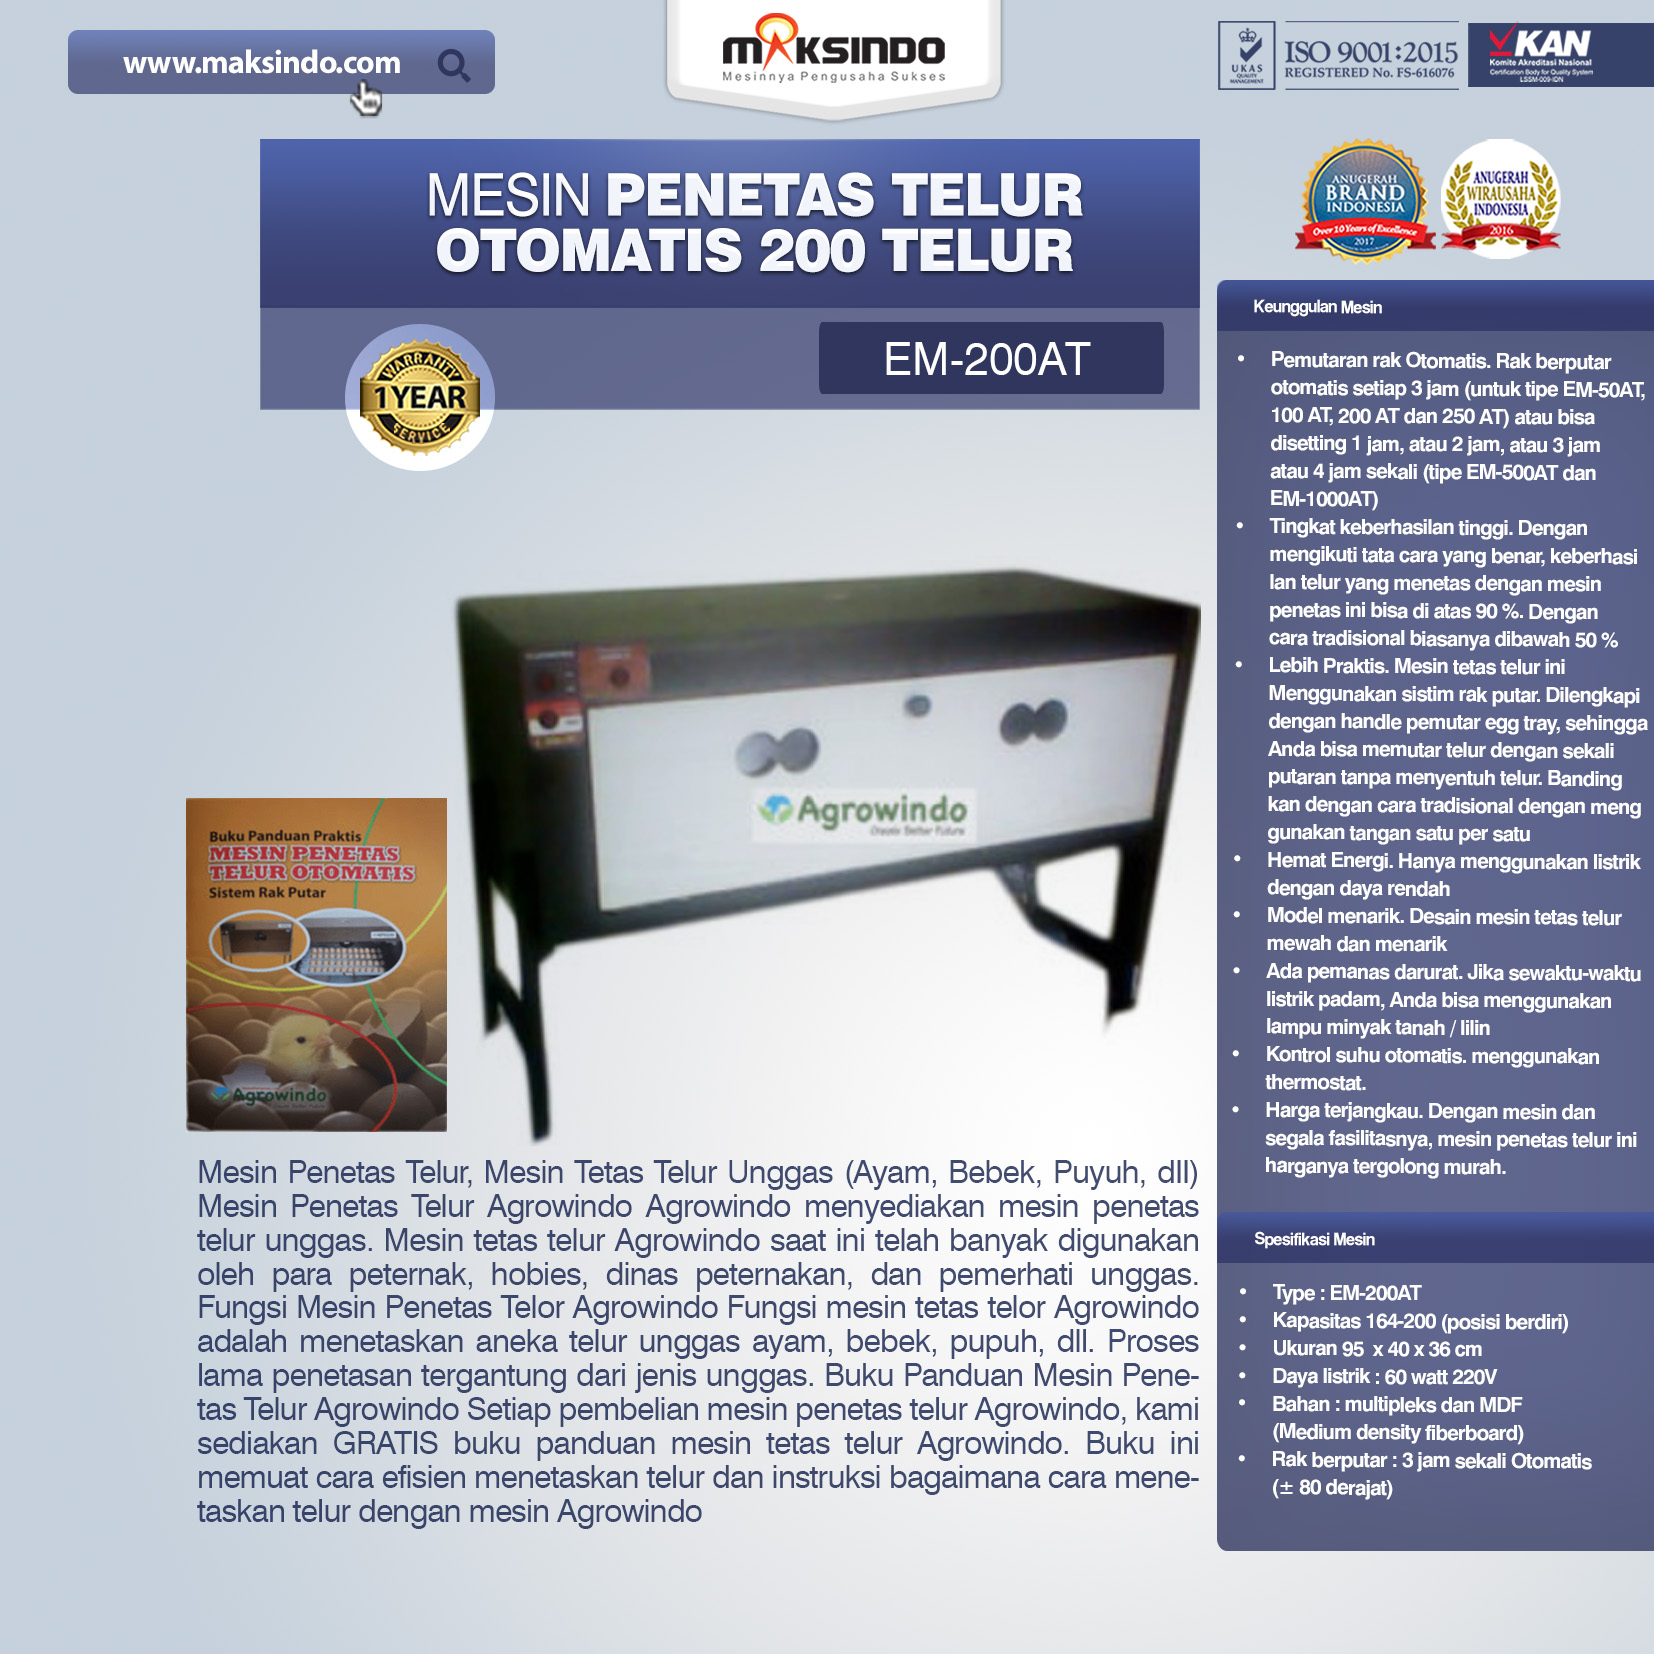 Jual Mesin Penetas Telur Otomatis Kapasitas 200 Telur (EM-200AT) di Palembang